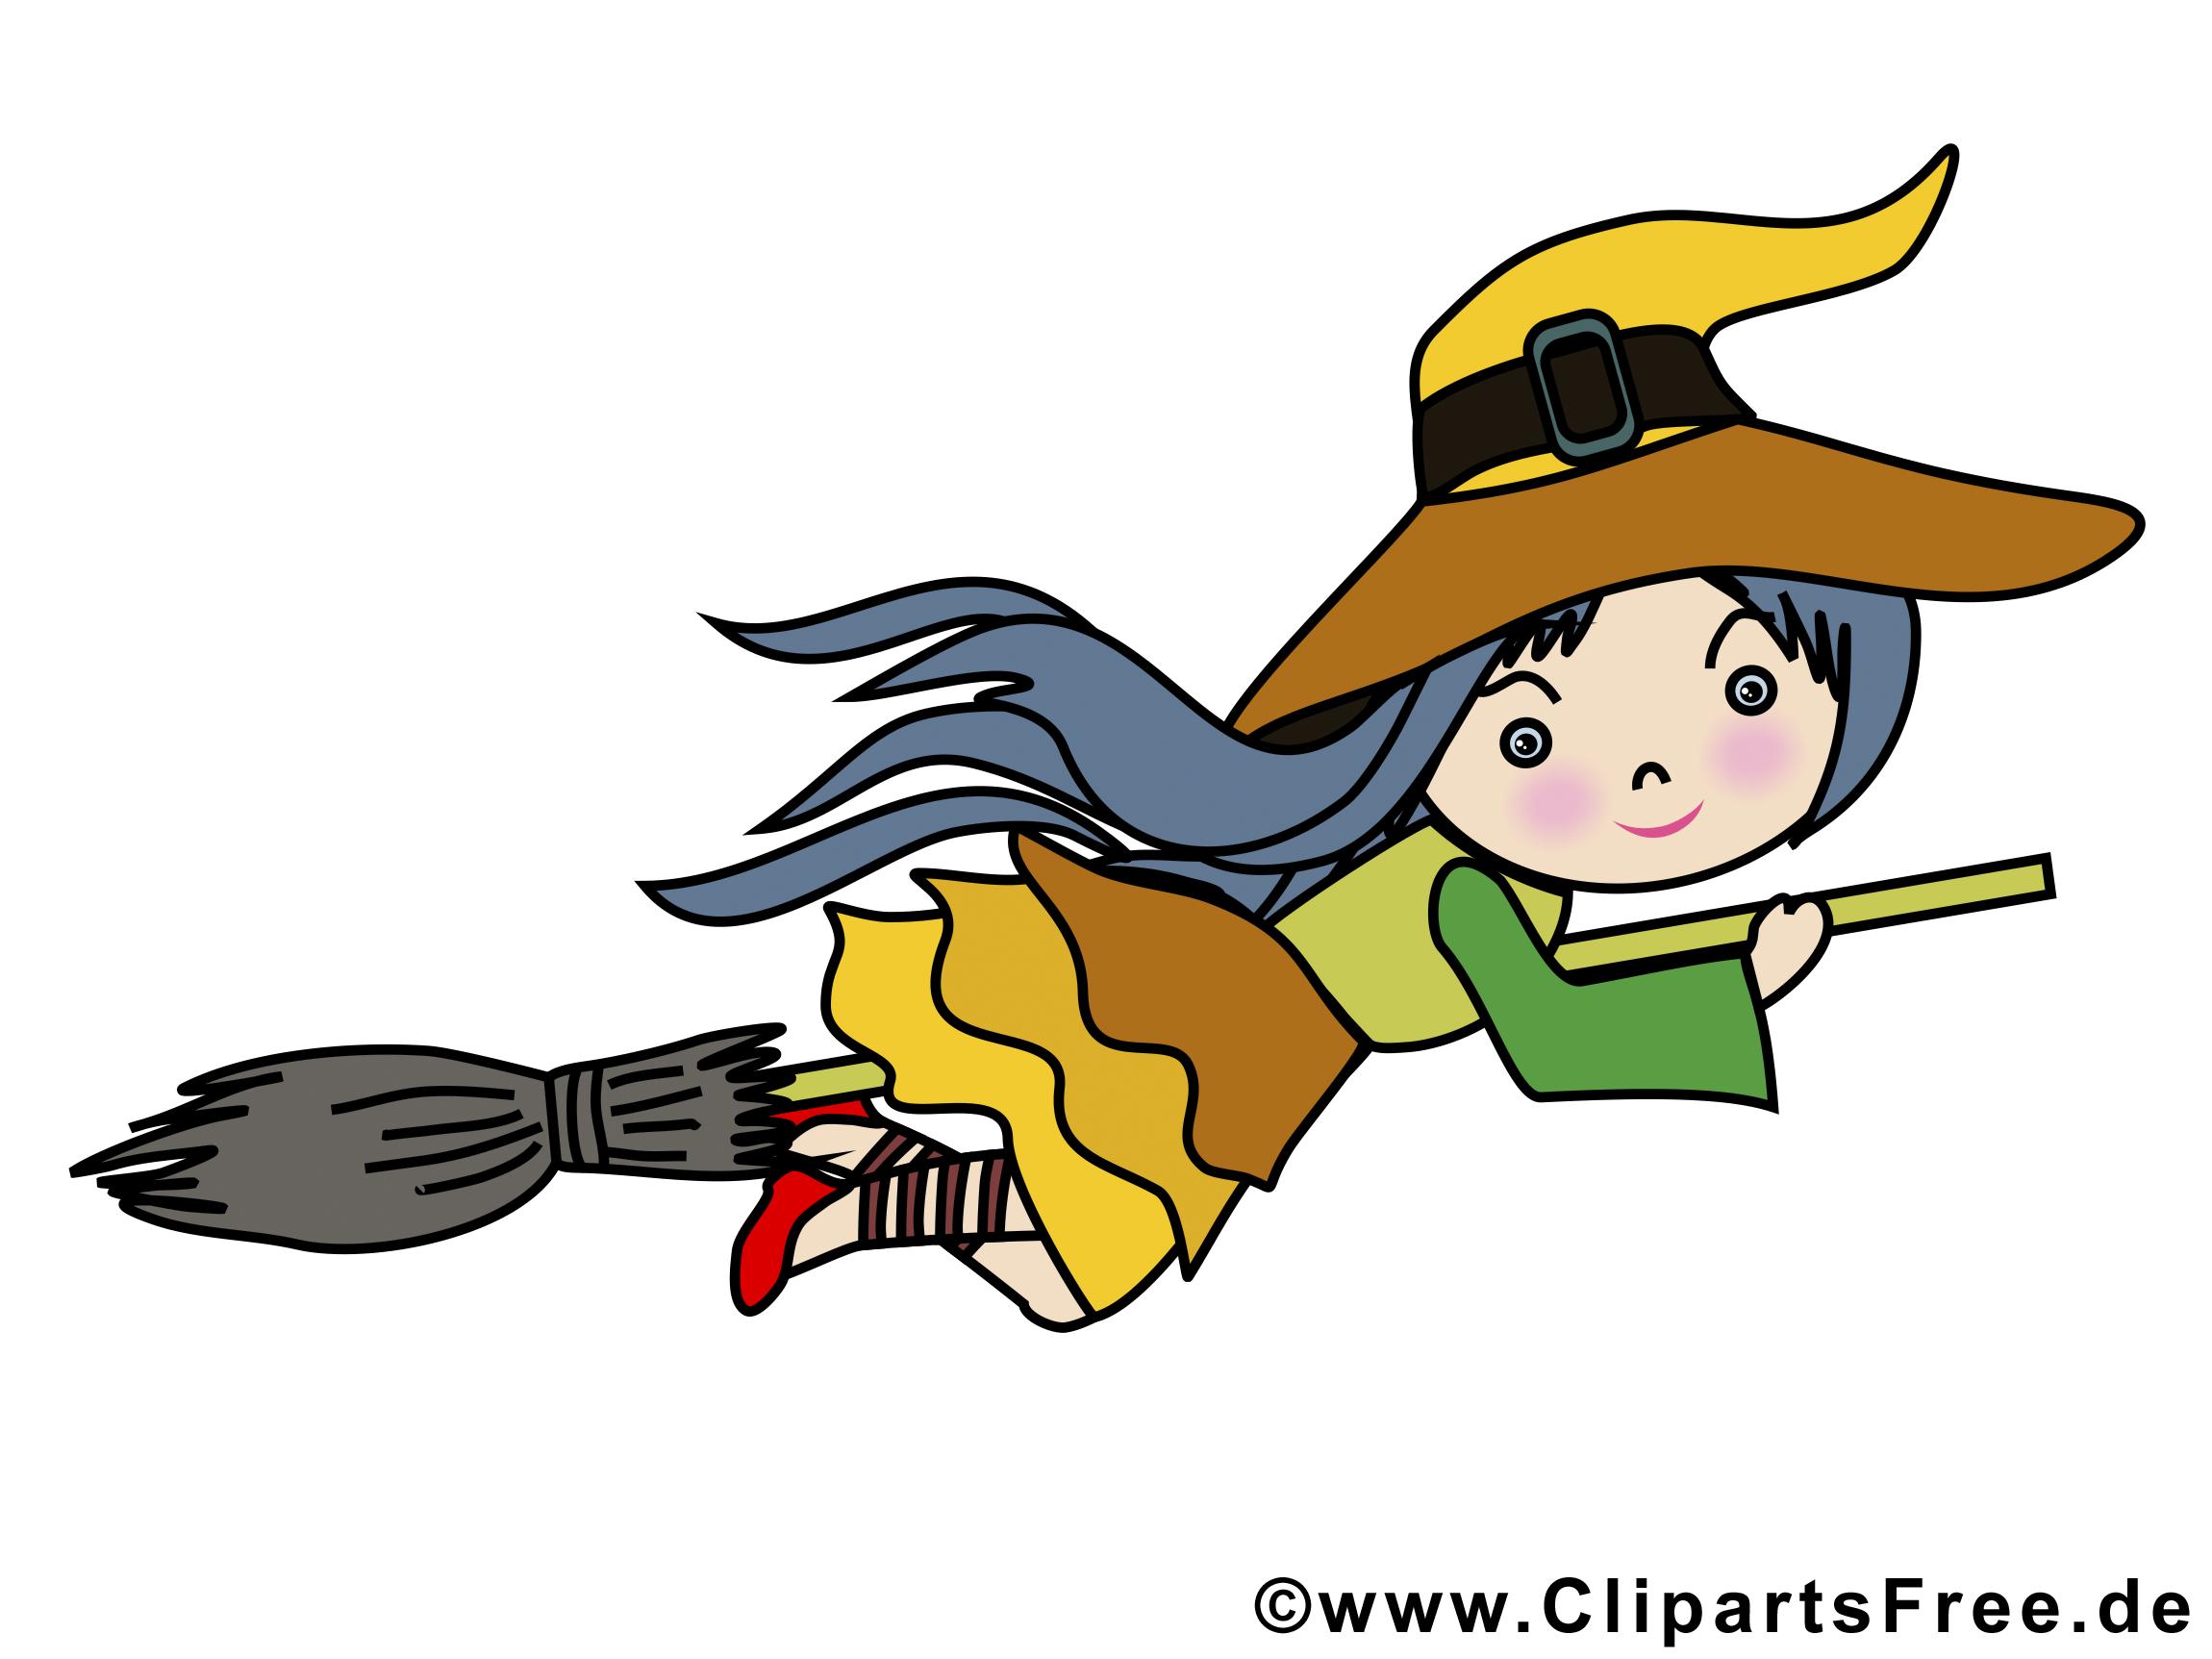 Illustration sorcière - Halloween images